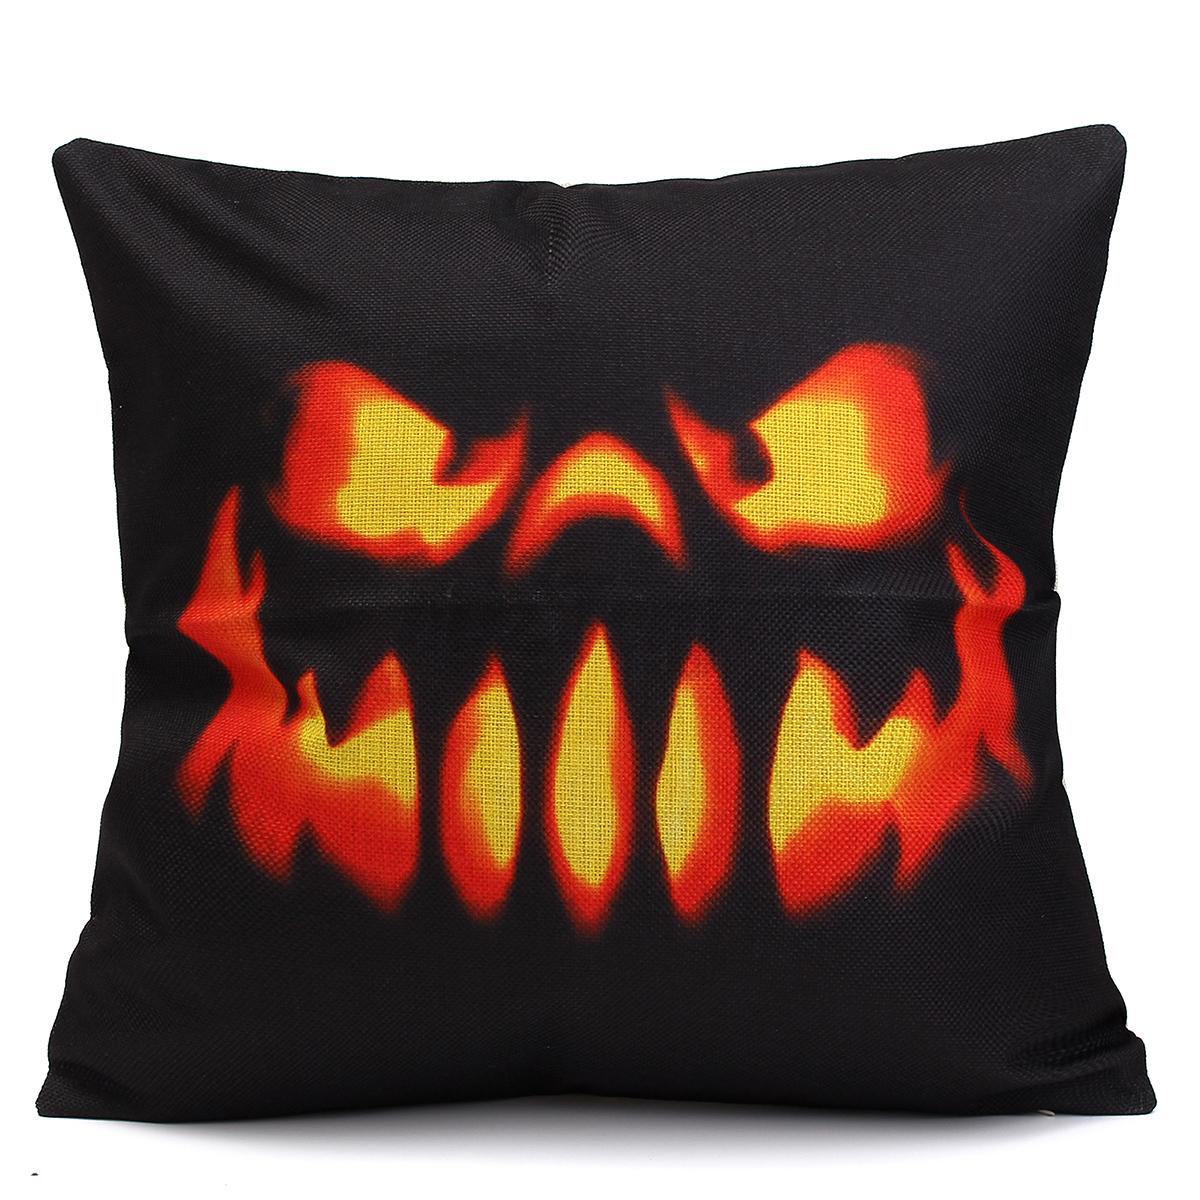 Linen-Throw-Pillow-Cases-Pumpkin-Devil-Sofa-Cushion-Cover-Halloween-Decorations